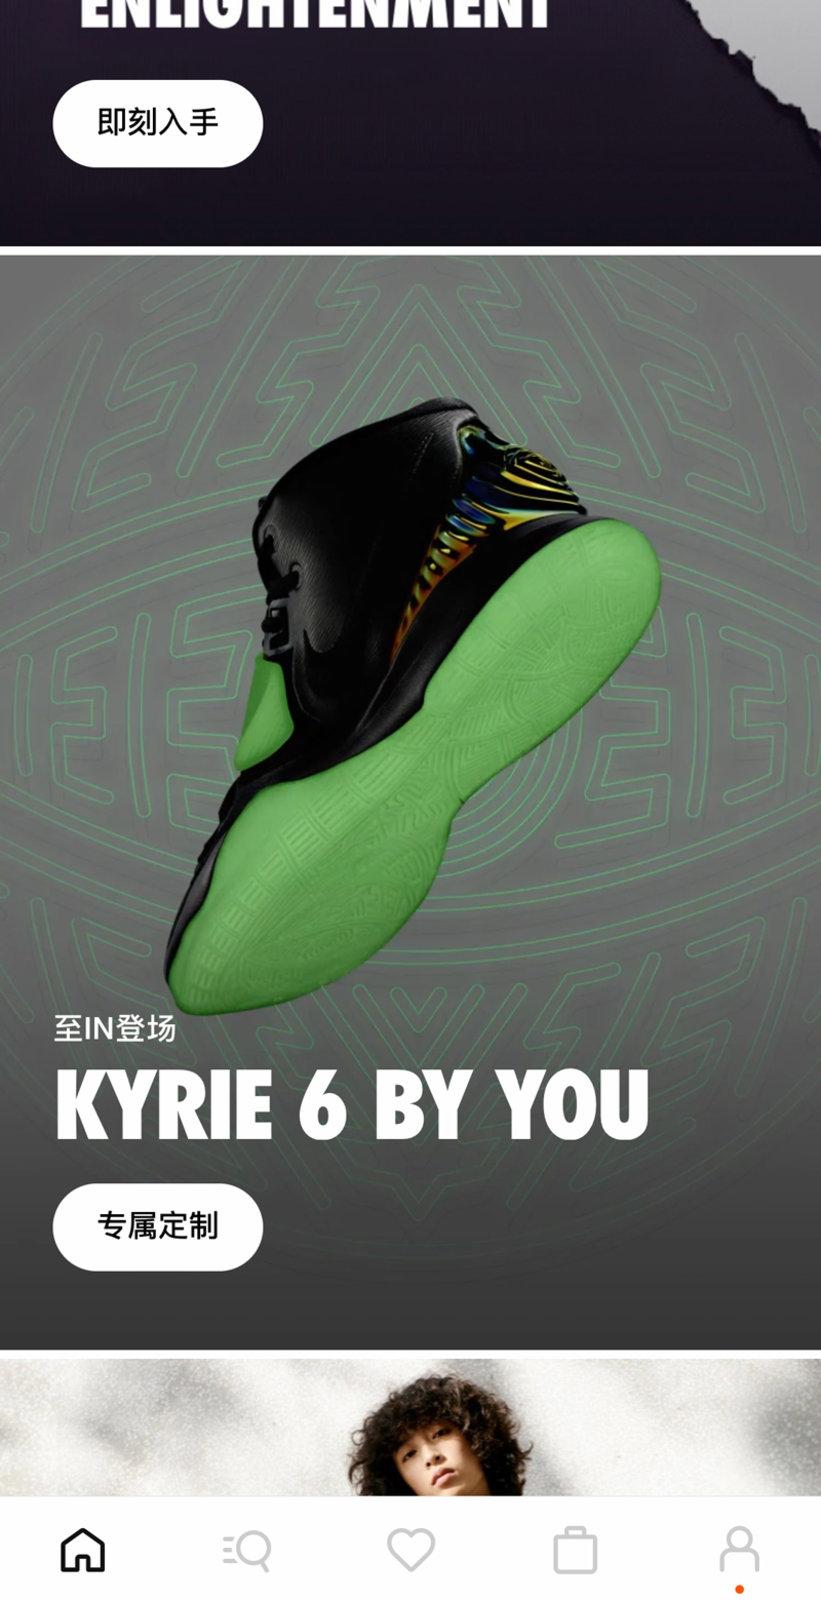 Kyrie 6,Air Yeezy 2,发售 完美还原 Air Yeezy 2!欧文 Kyrie 6 夜光定制刚刚上架!